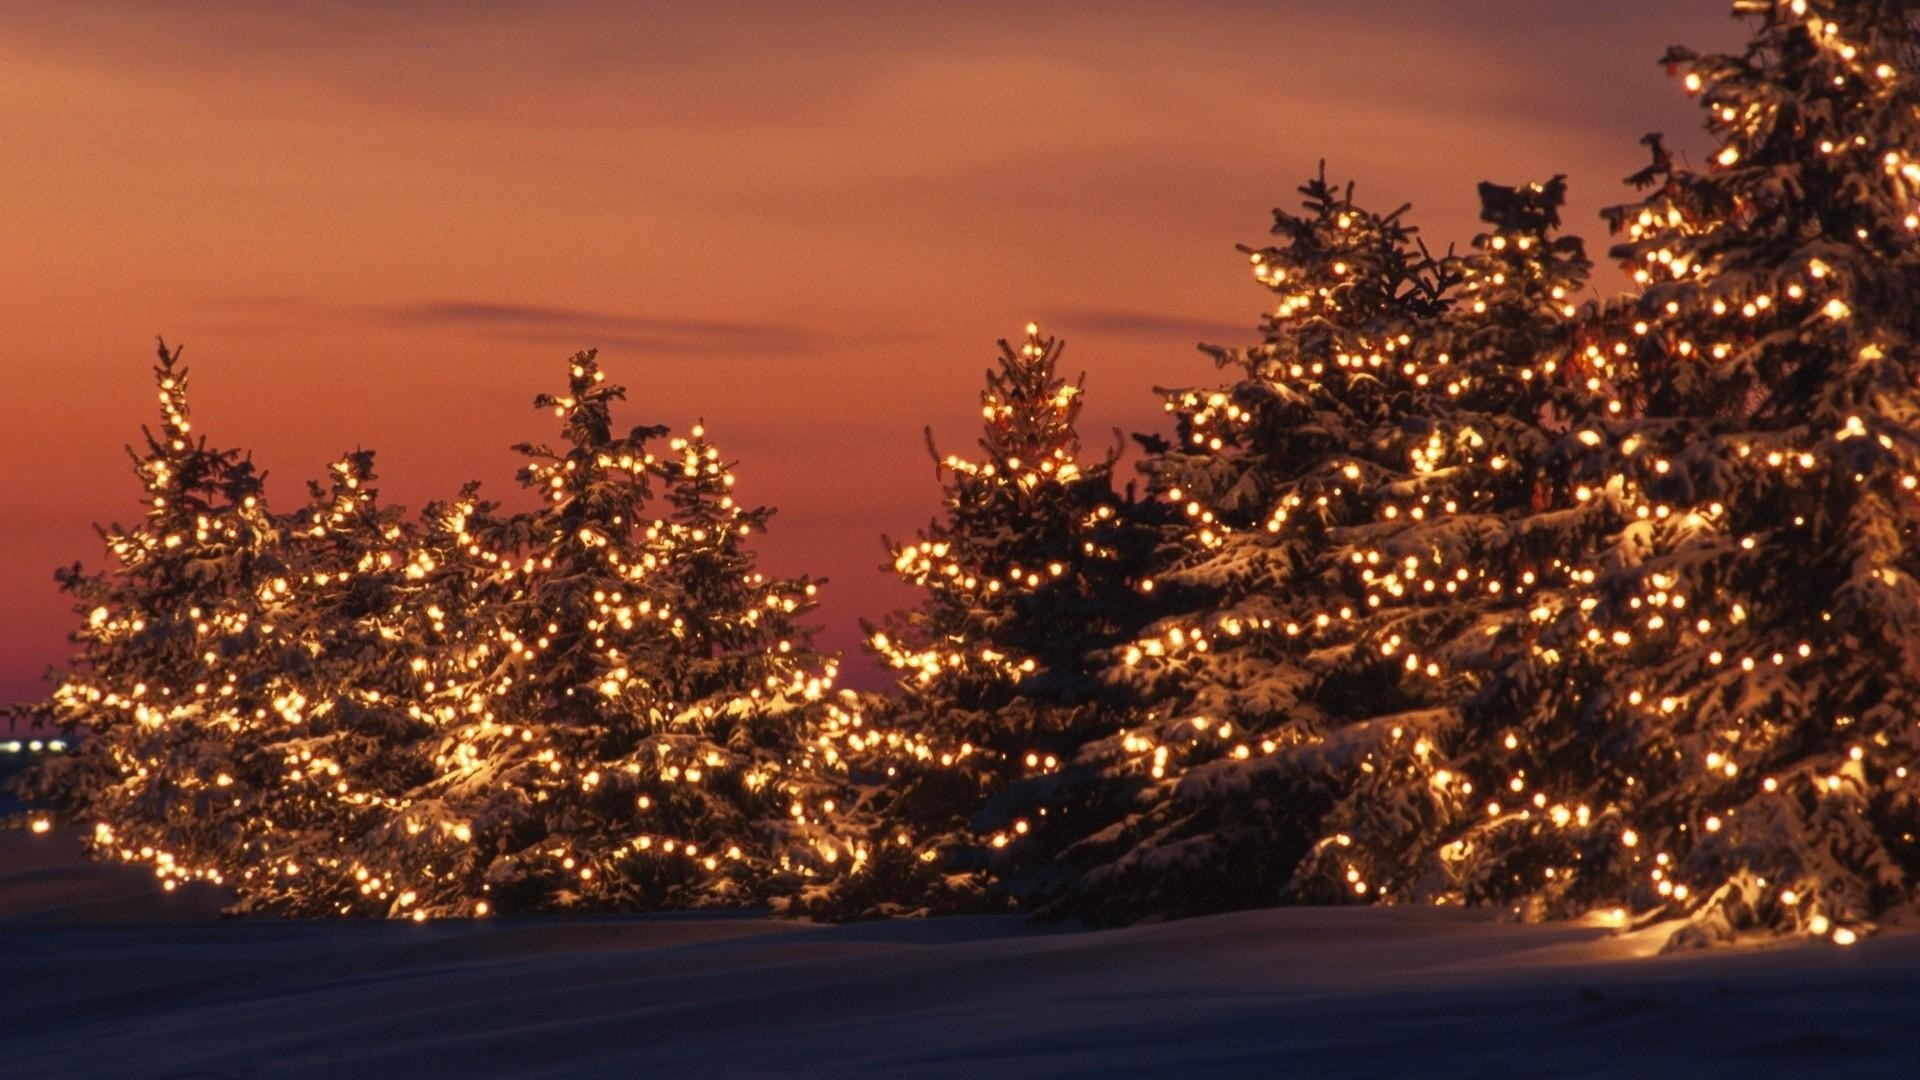 Christmas Lights wallpaper ·① Download free cool full HD